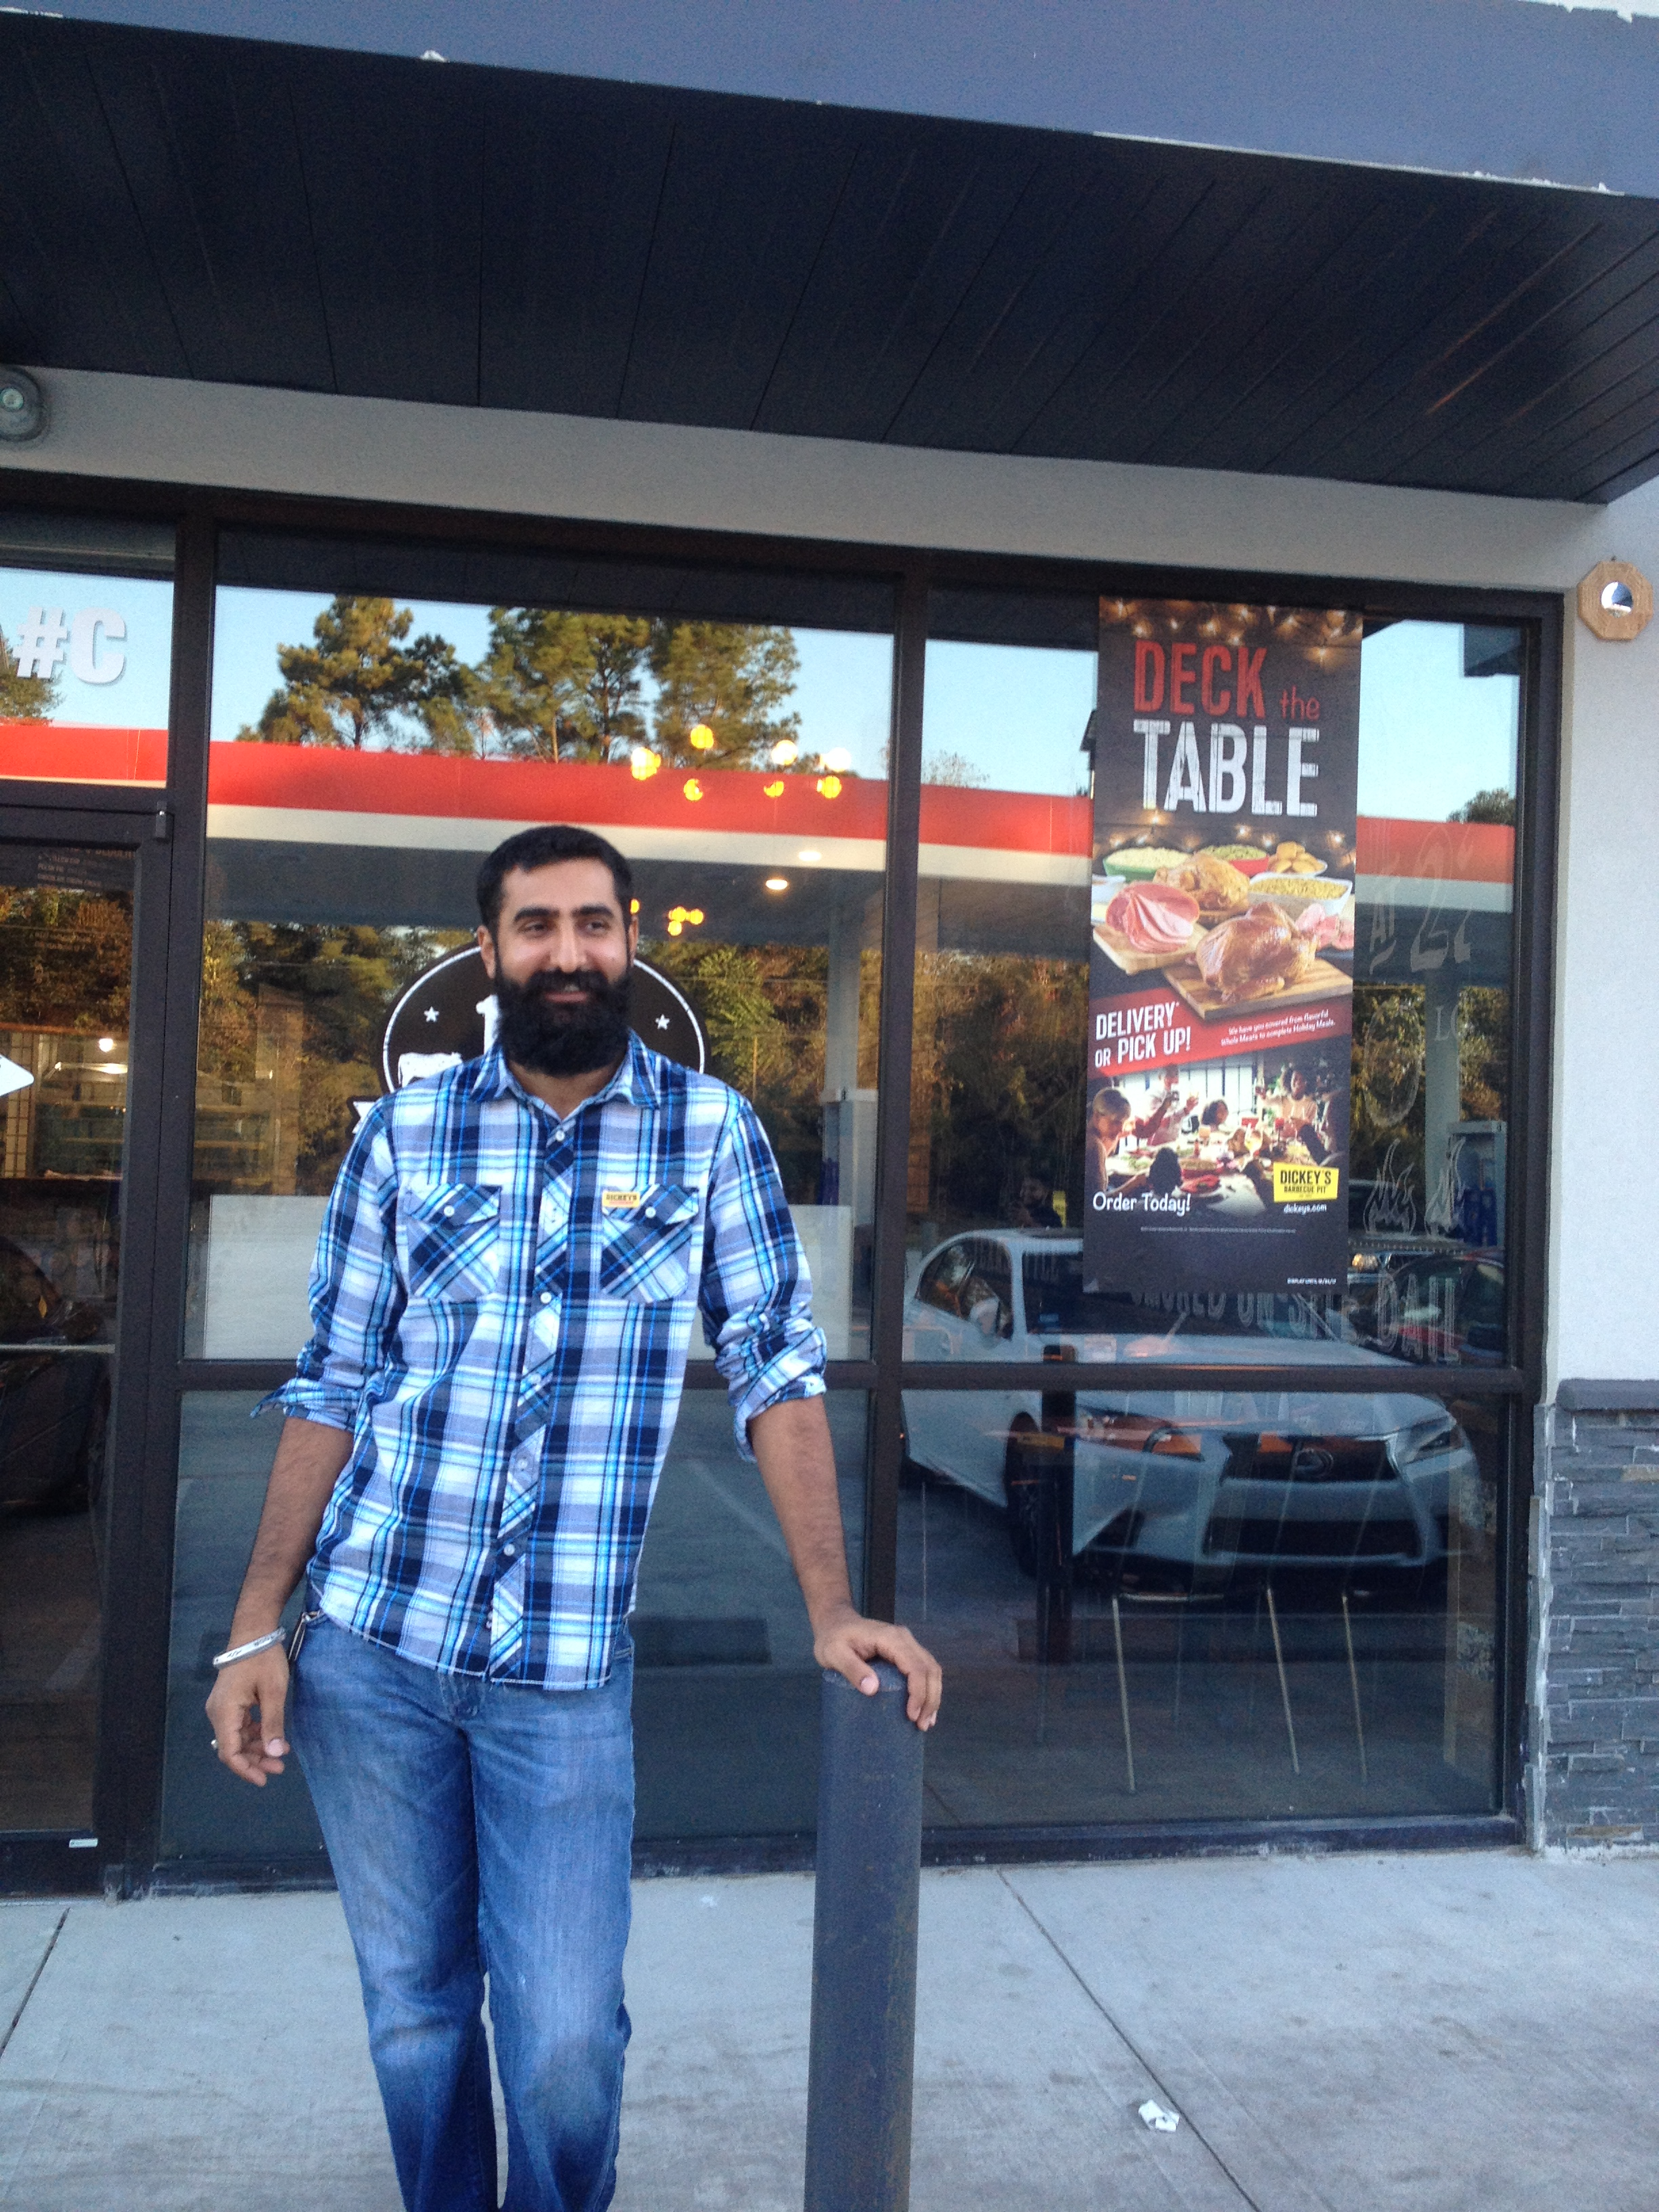 Local Barbecue Fanatic Opens New Dickey's Location in Houston